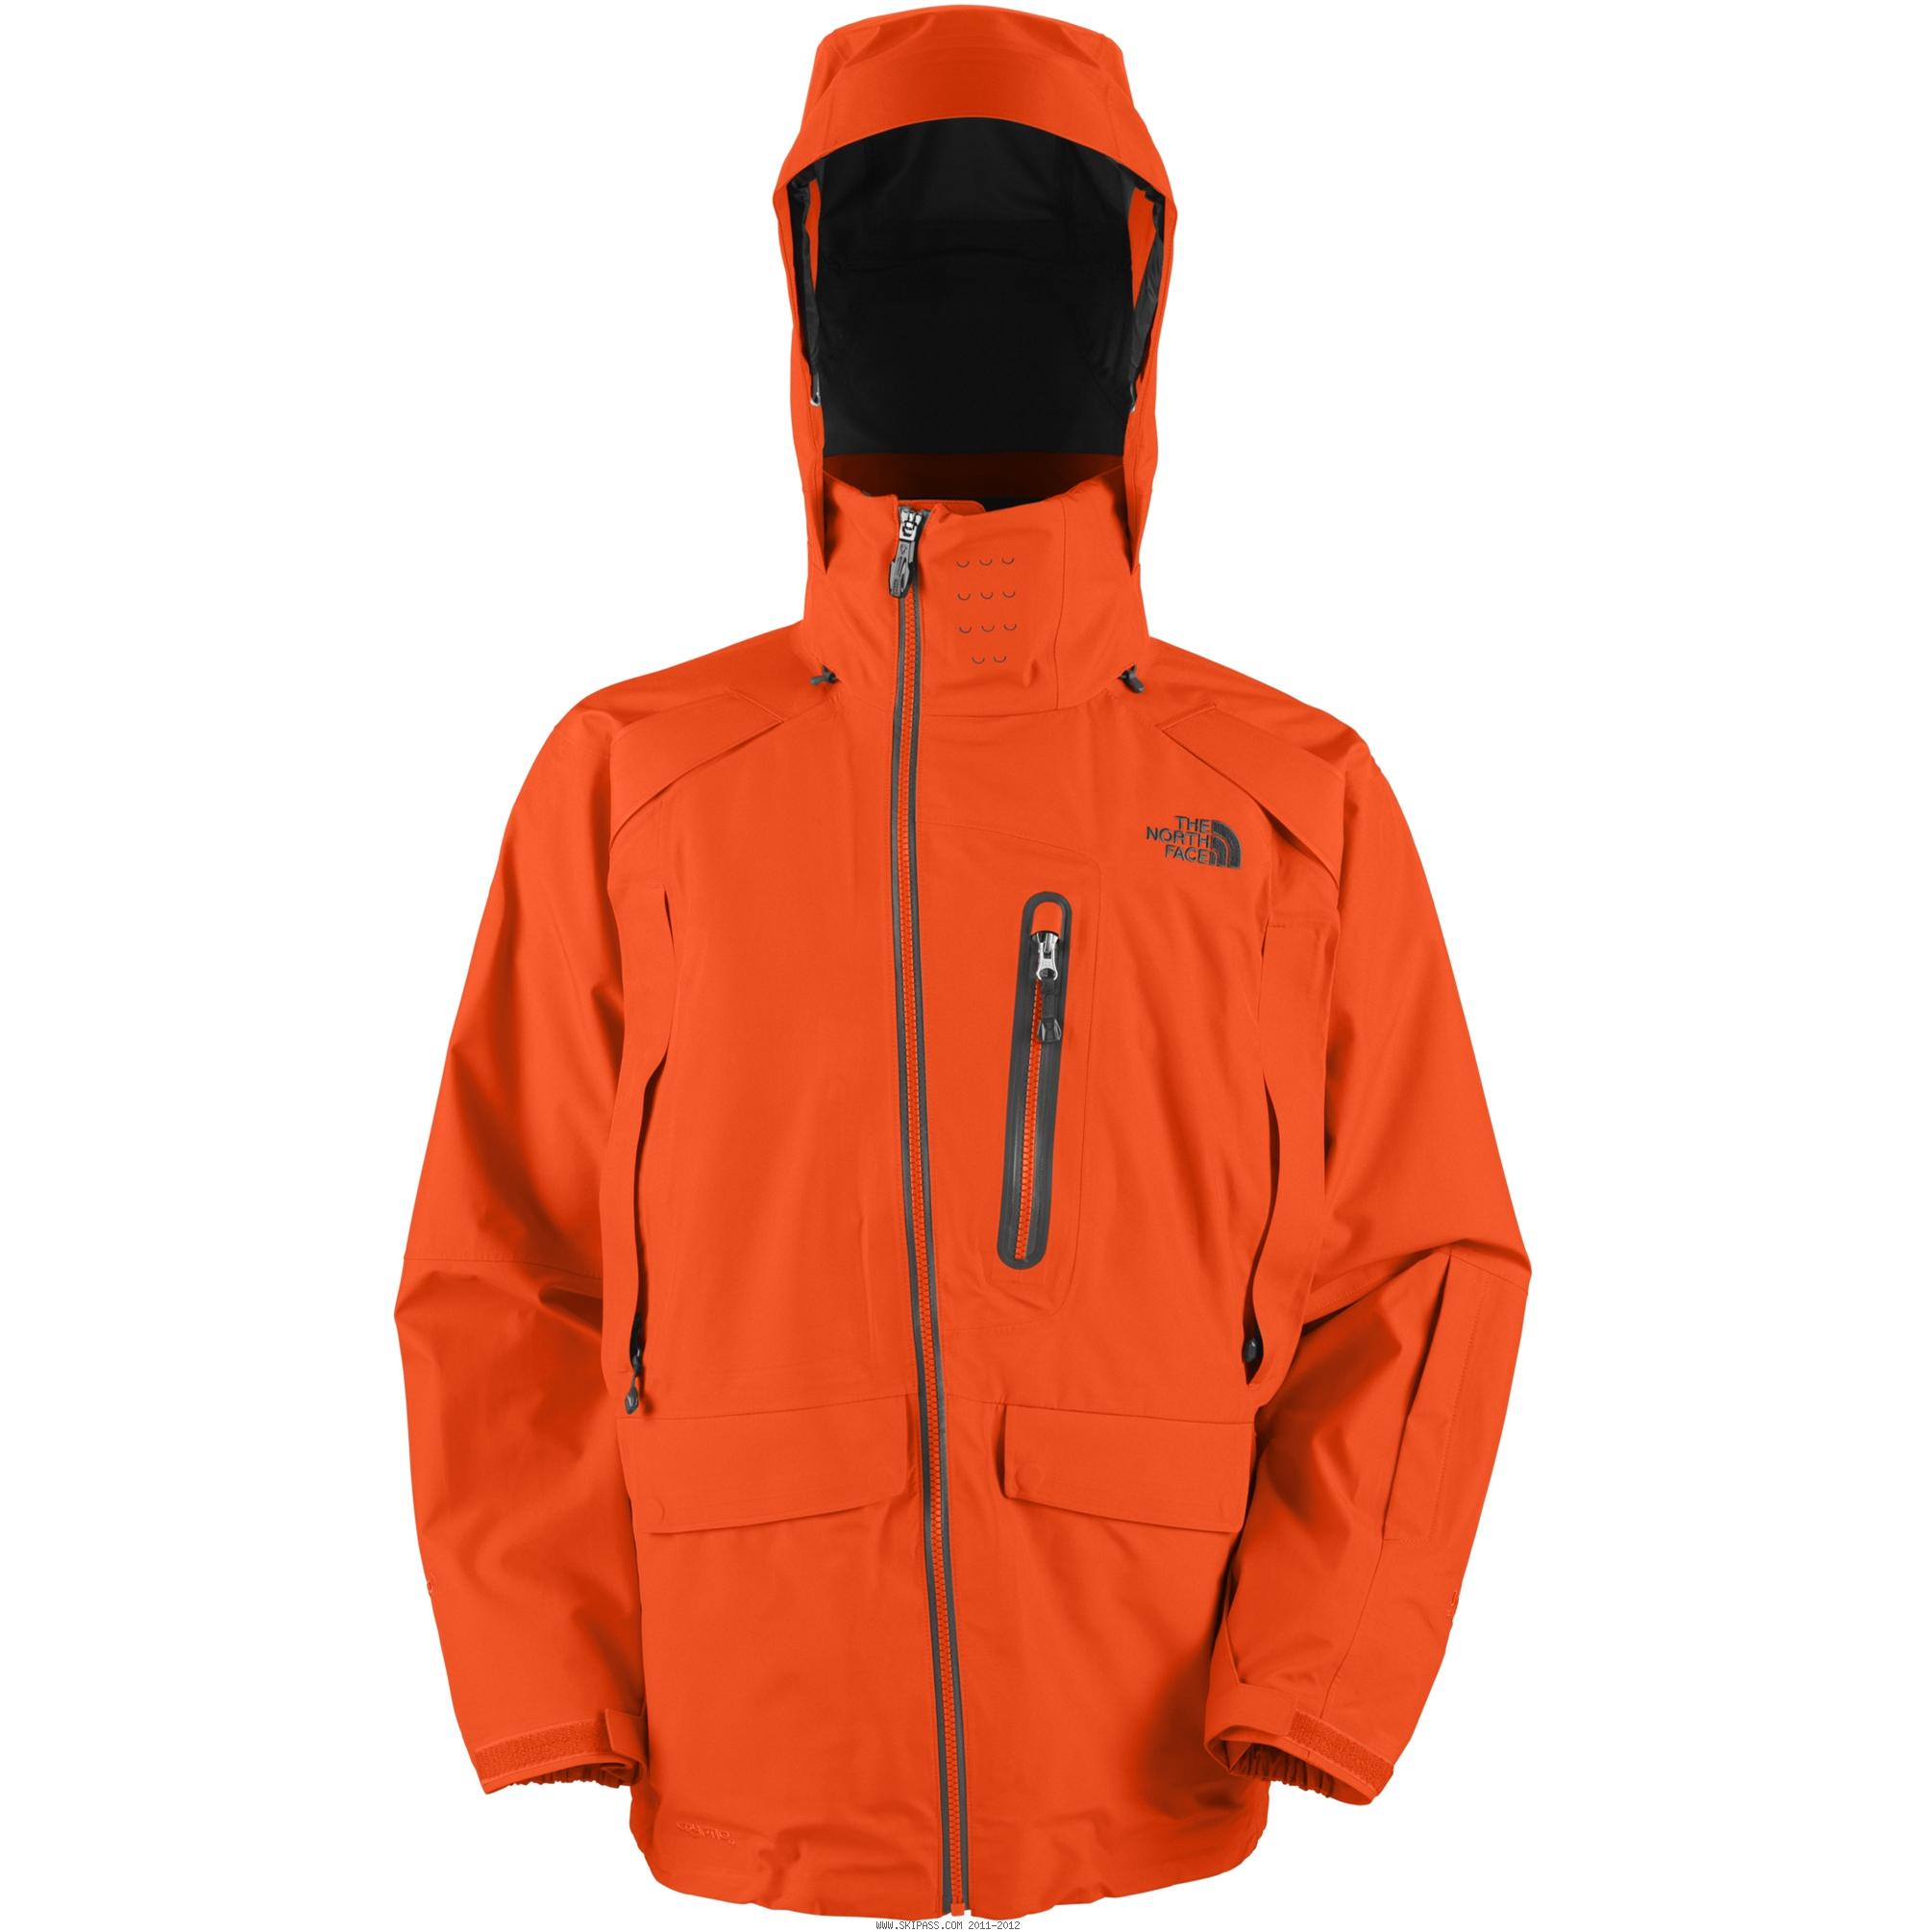 puros de hostos veste north face orange. Black Bedroom Furniture Sets. Home Design Ideas